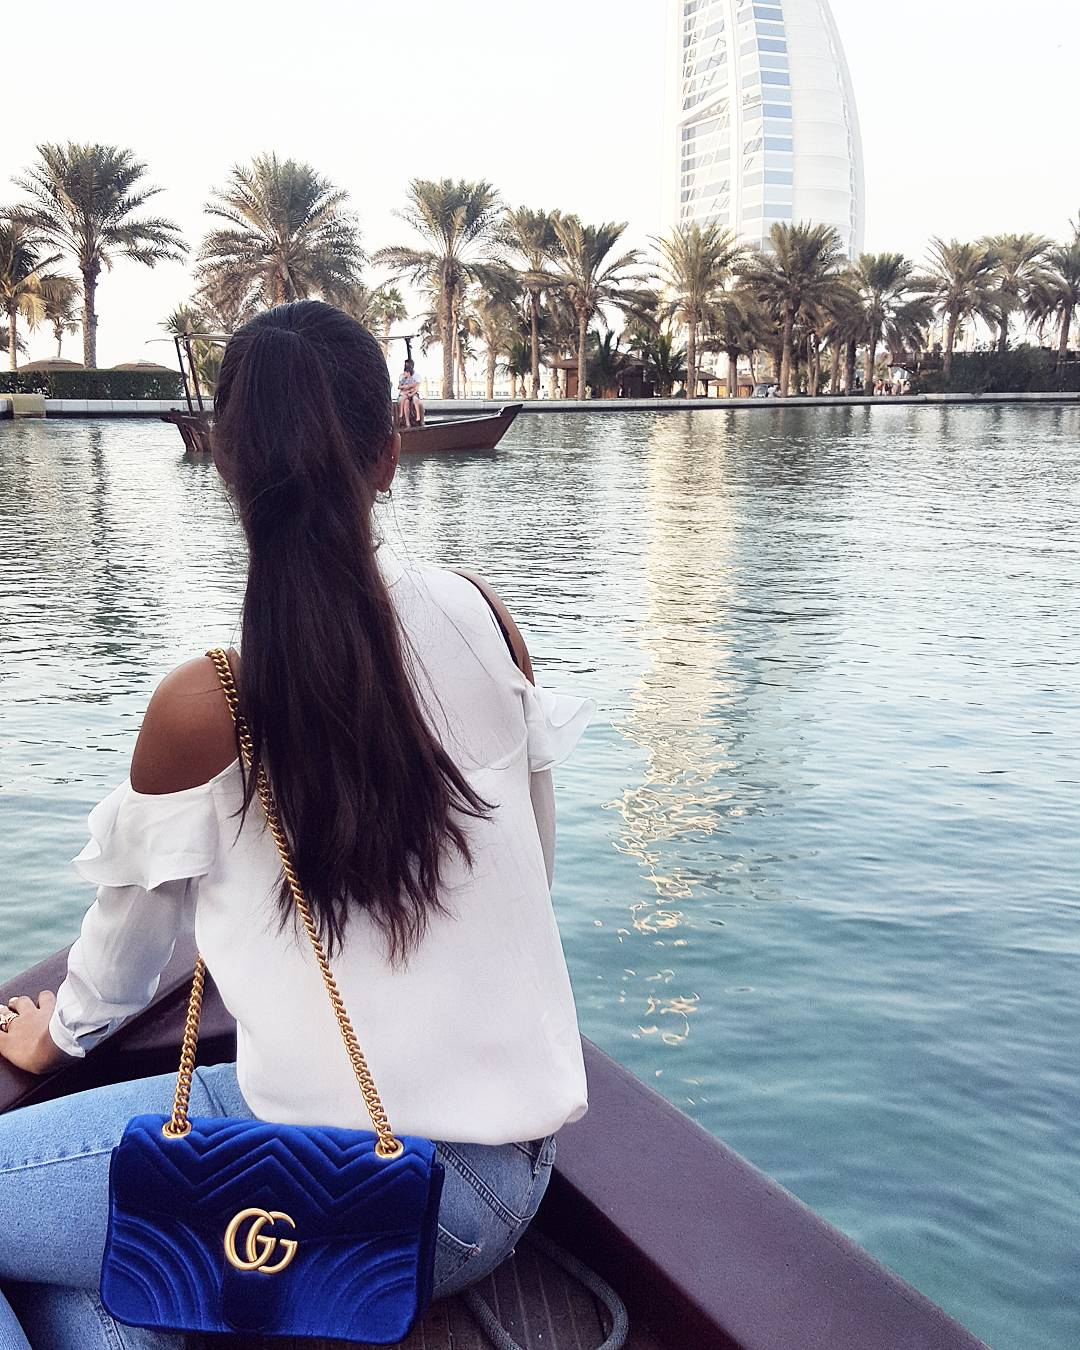 Dubai - Souq Madinat Jumeriah